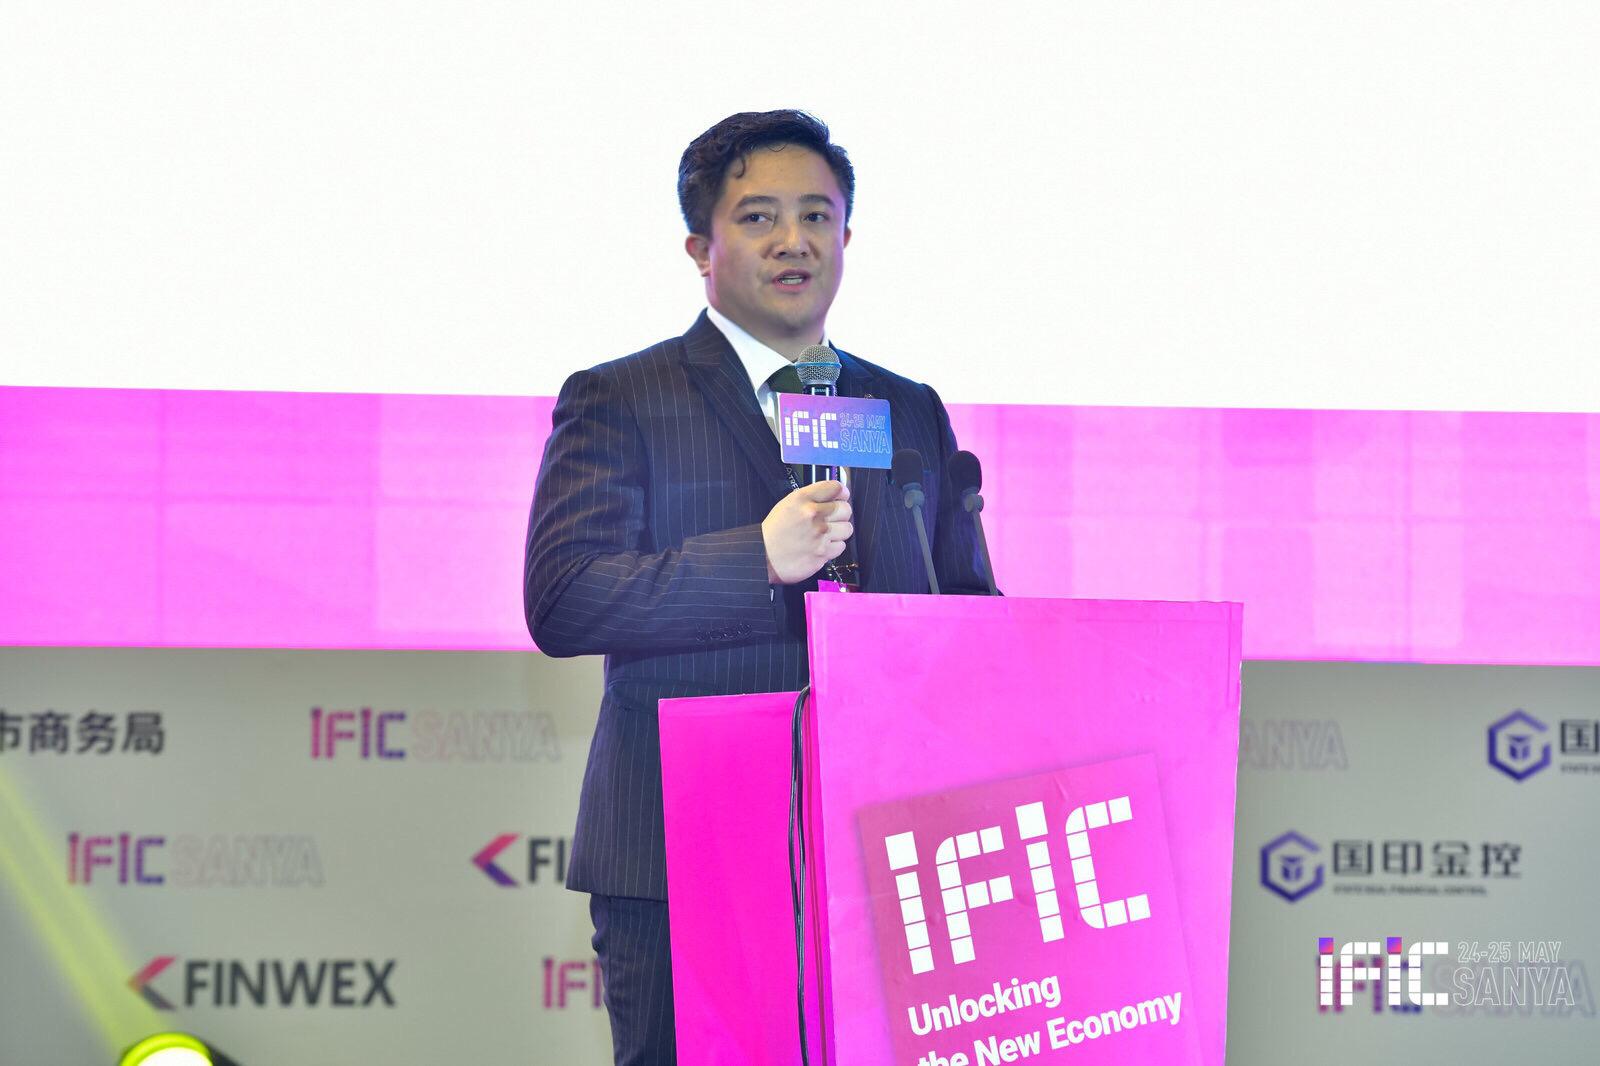 FINWEX创始人尤立:用区块链构建数字经济的信任机制